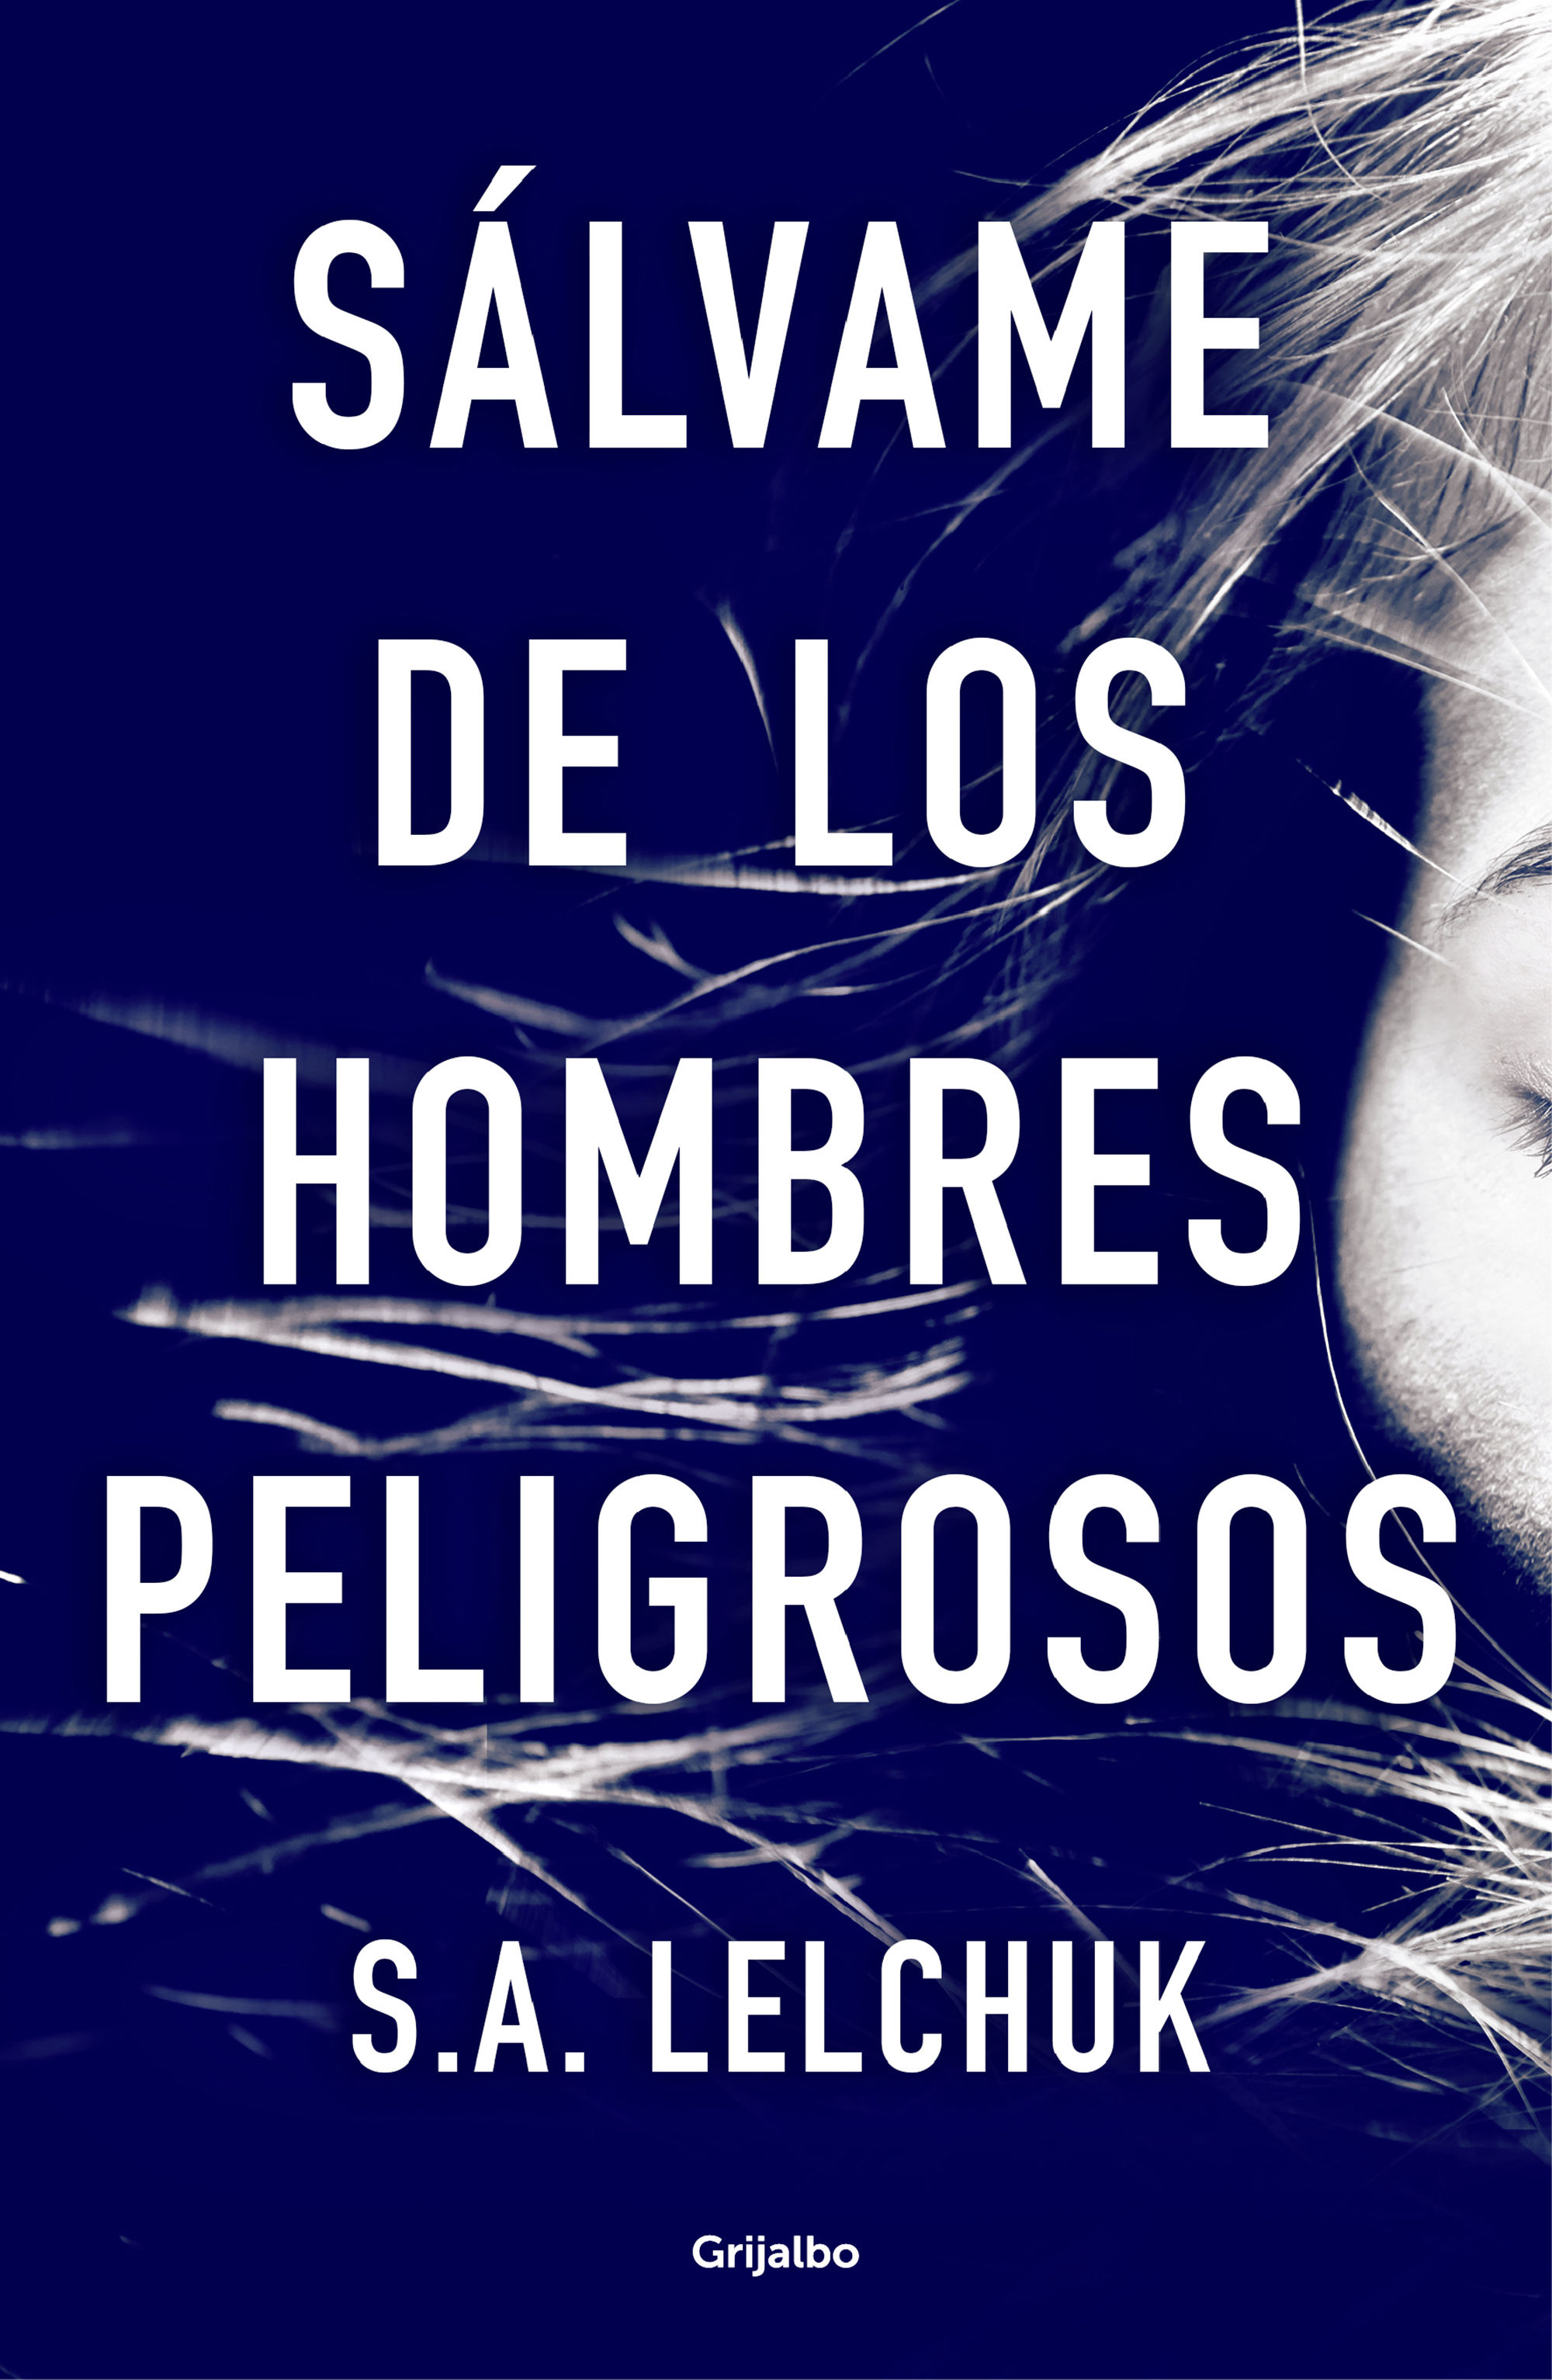 SÁLVAME DE LOS HOMBRES PELIGROSOS